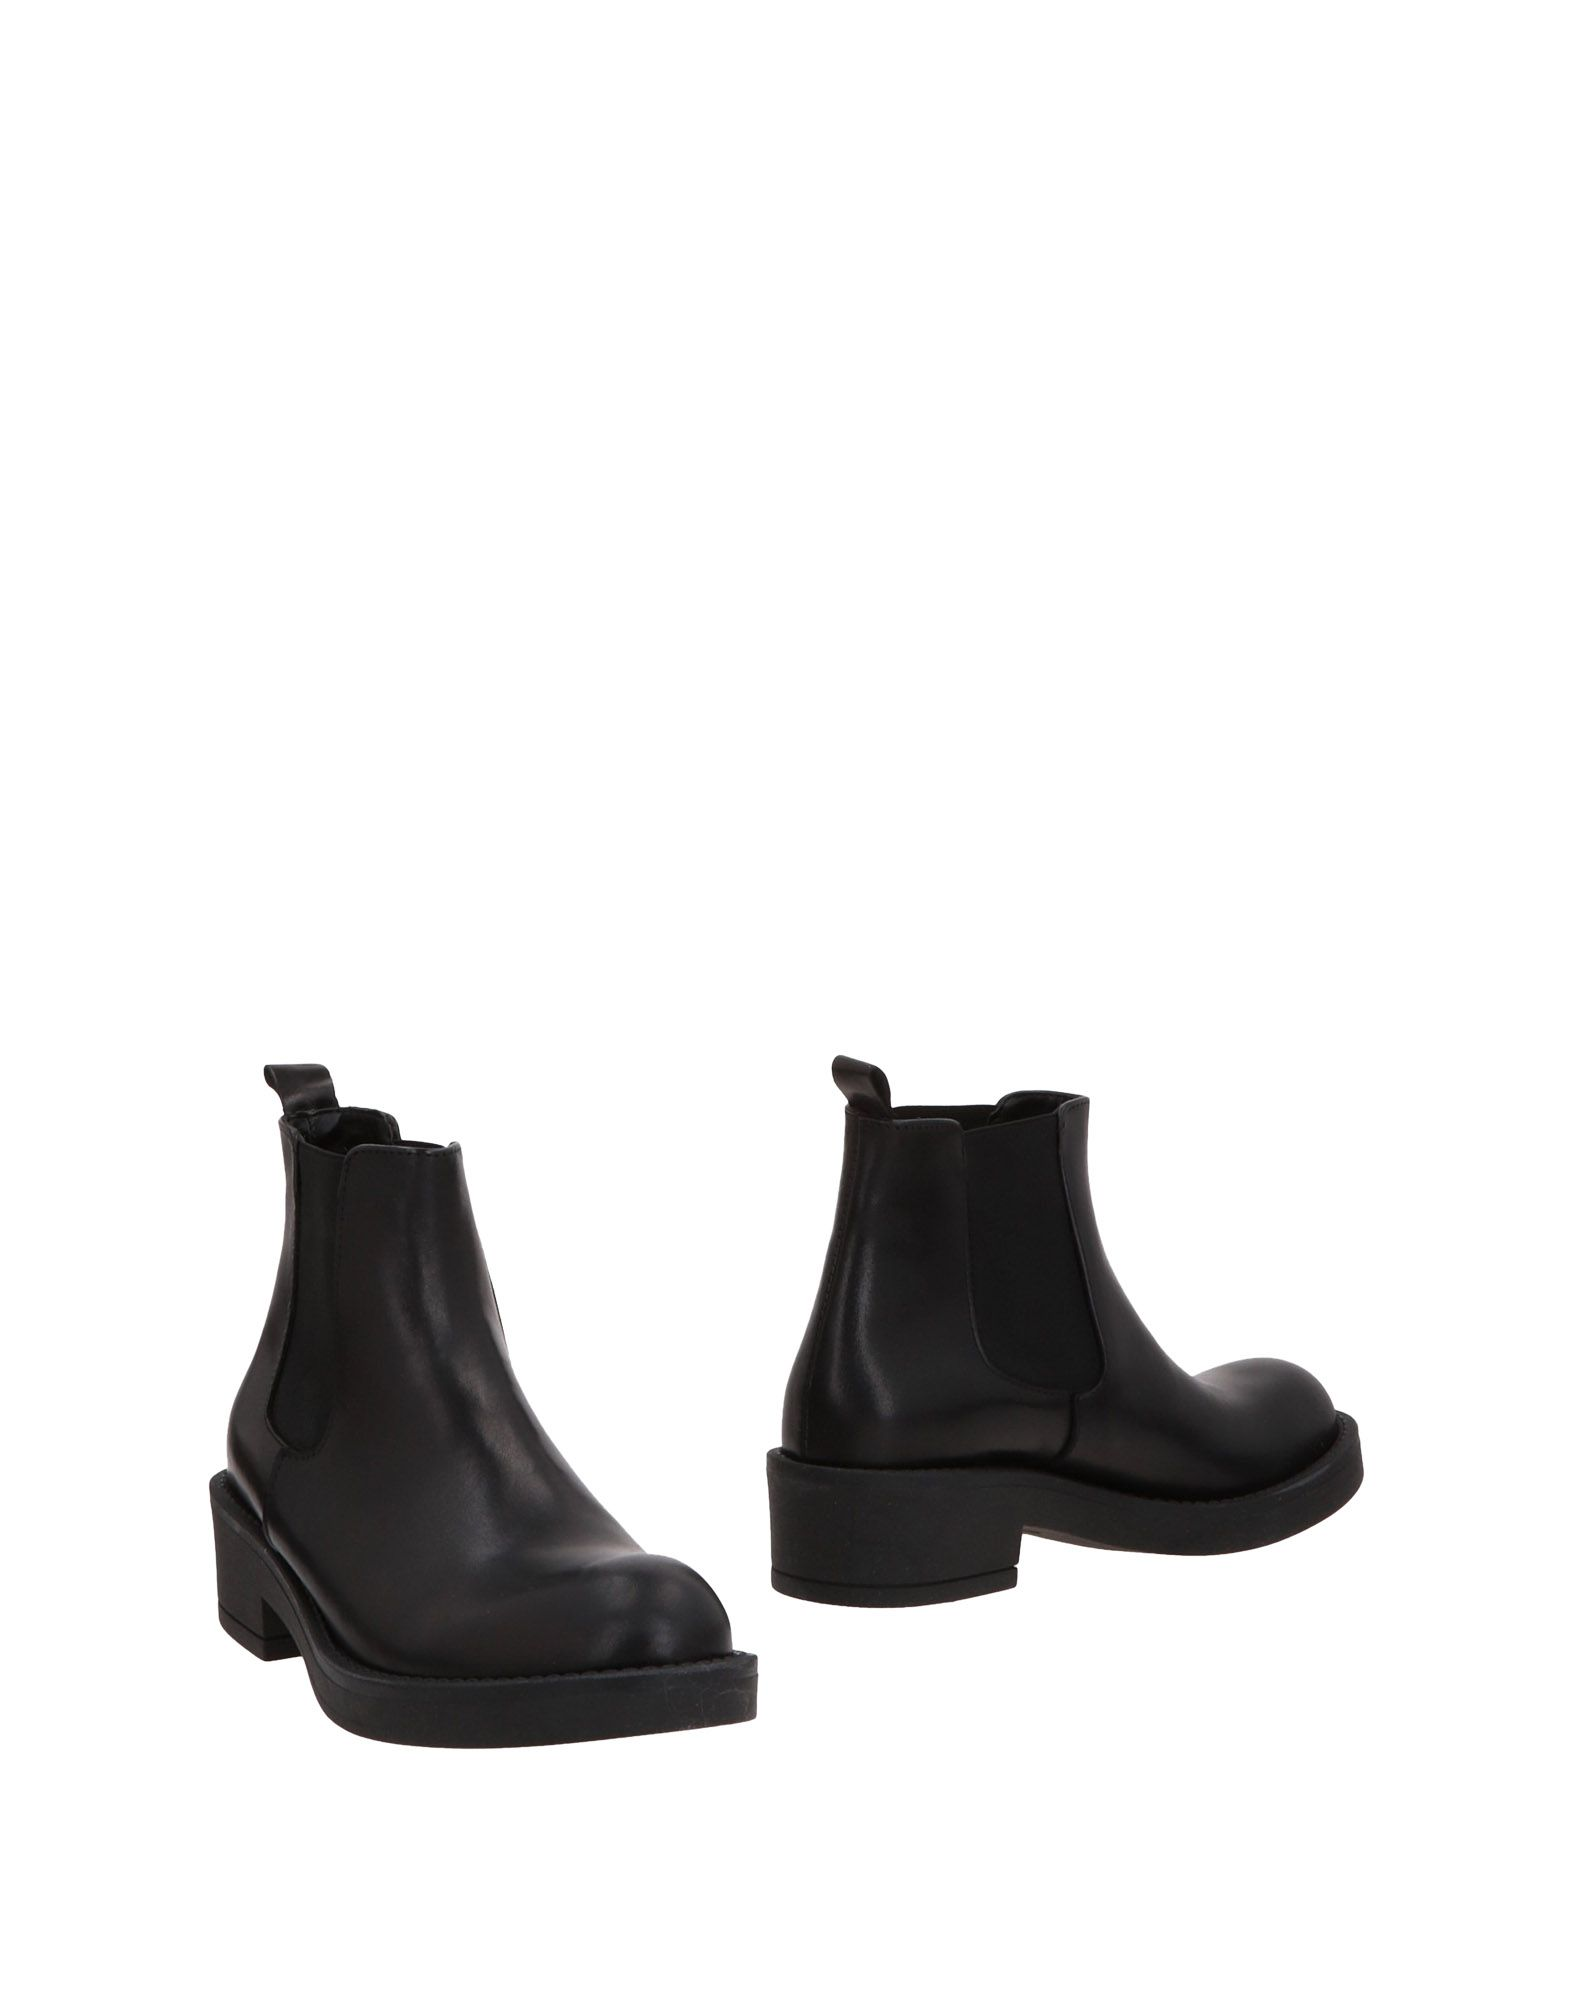 Unlace Chelsea Boots Damen  11474872PX Gute Qualität beliebte Schuhe